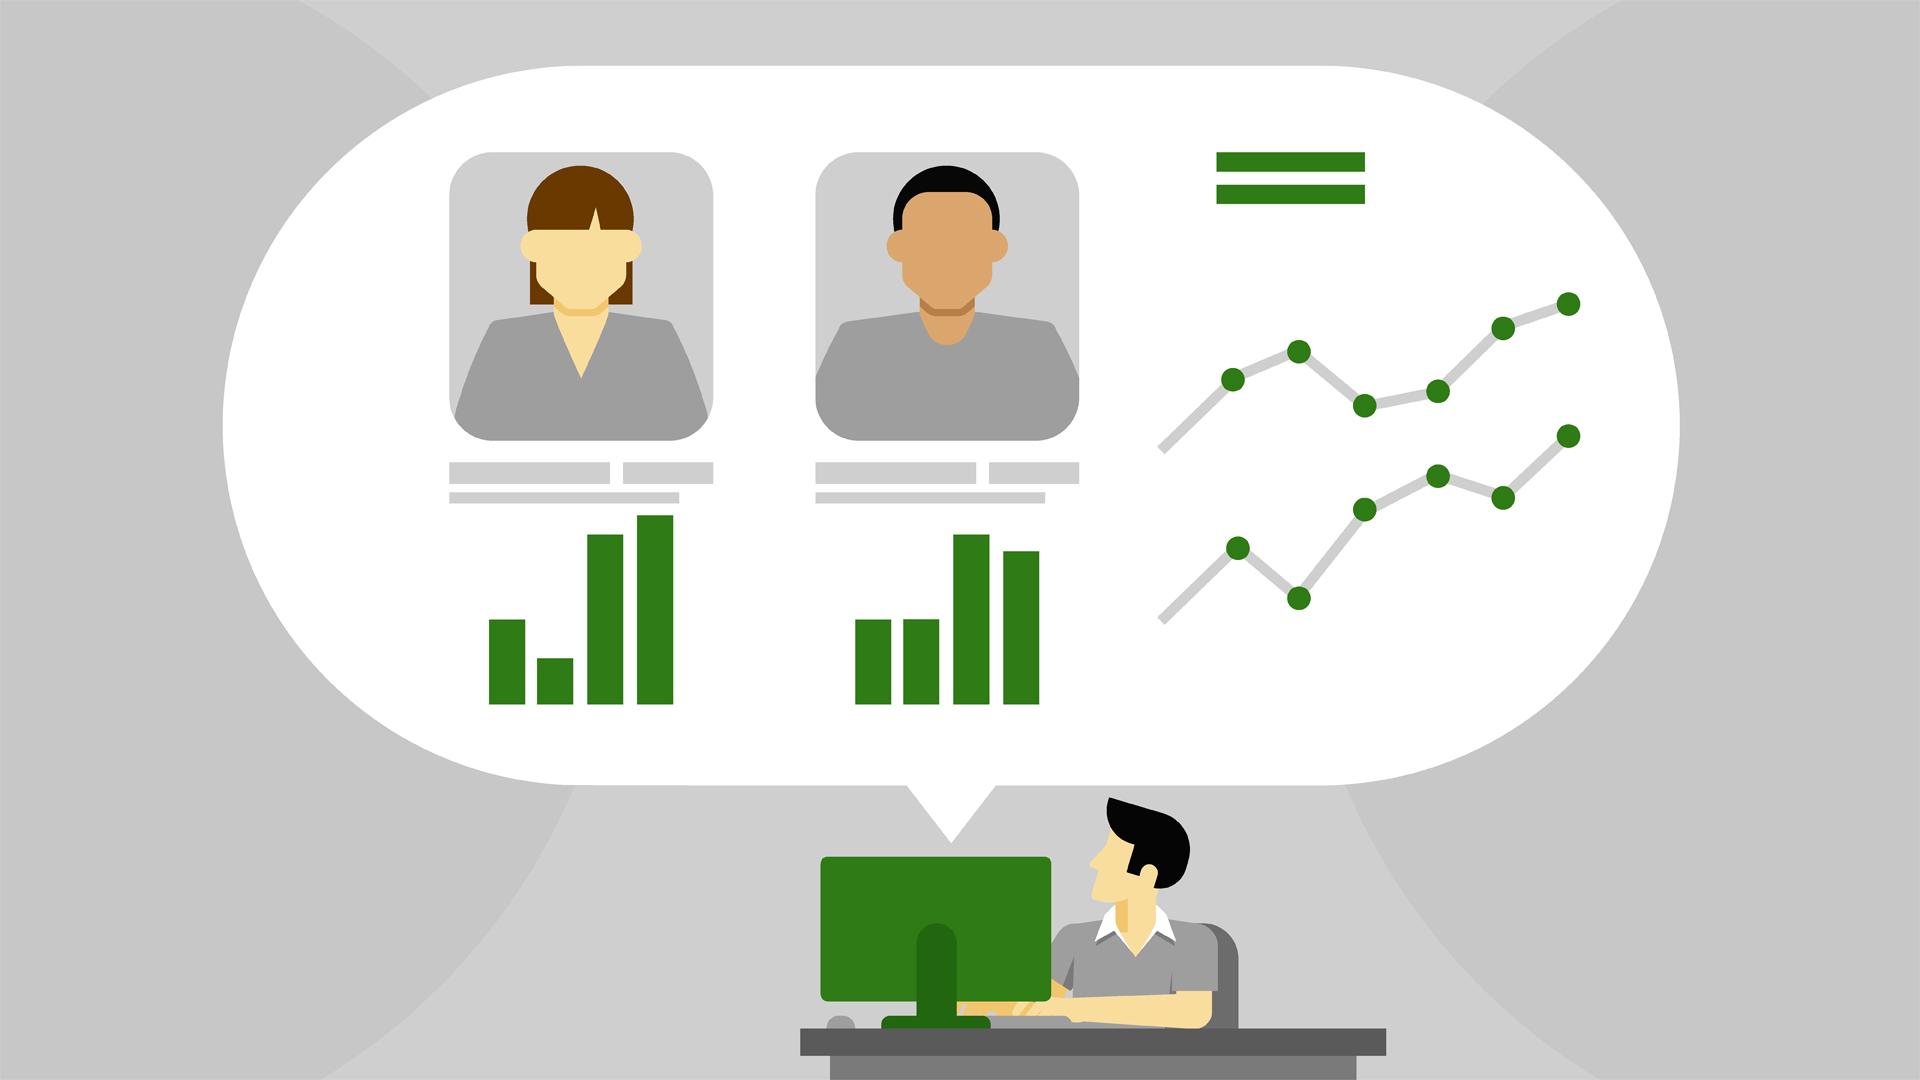 سامانه مدیریت یادگیری